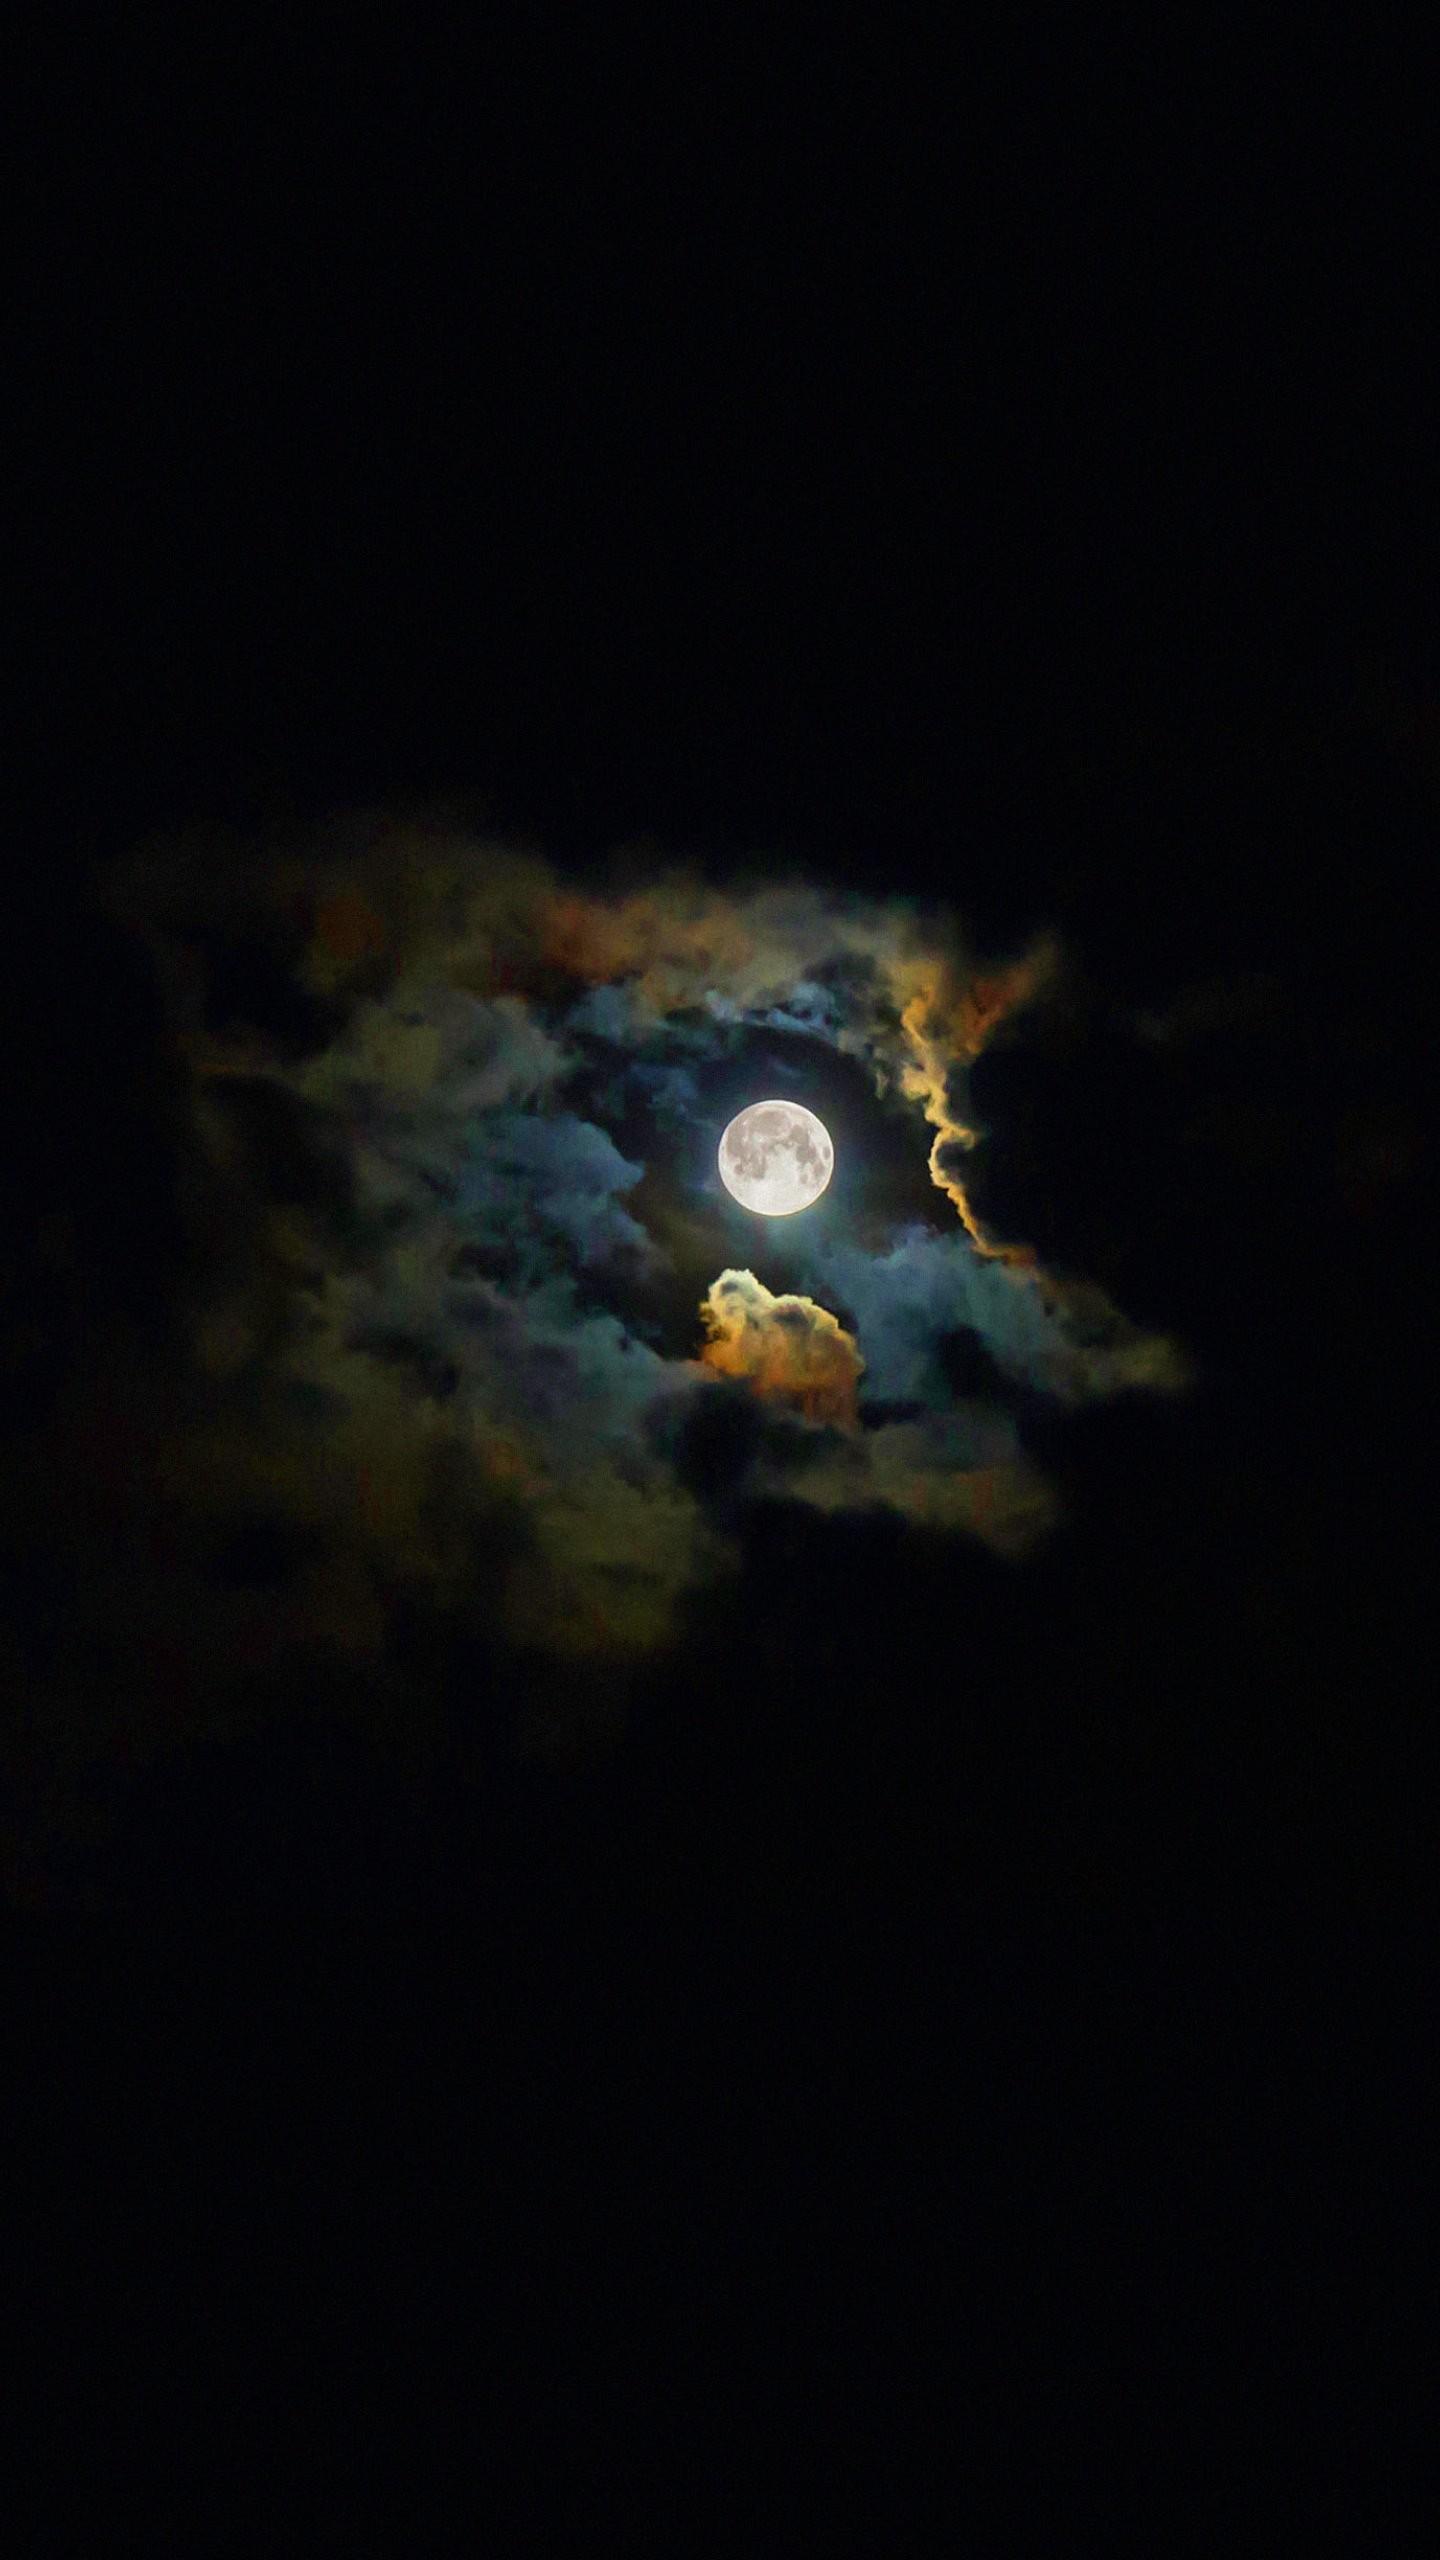 Landscape moon shiny black | wallpaper.sc SmartPhone